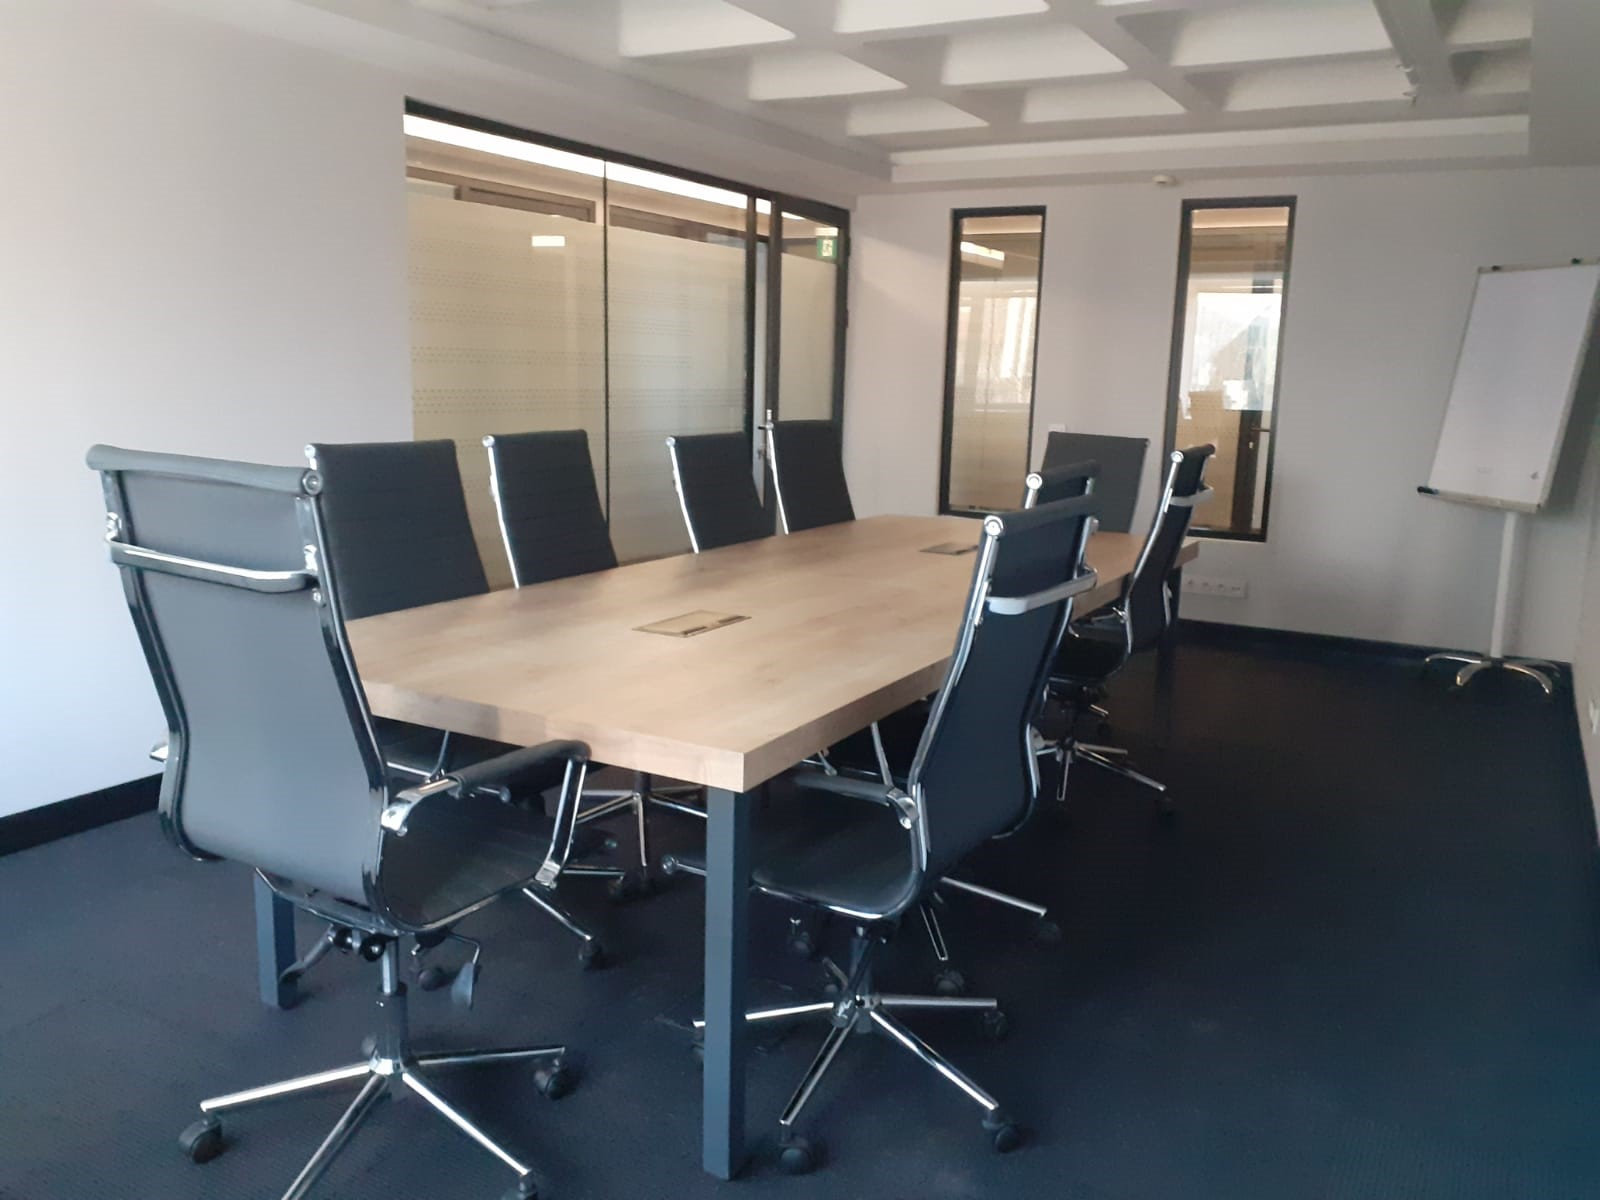 Kanyon Meeting Room